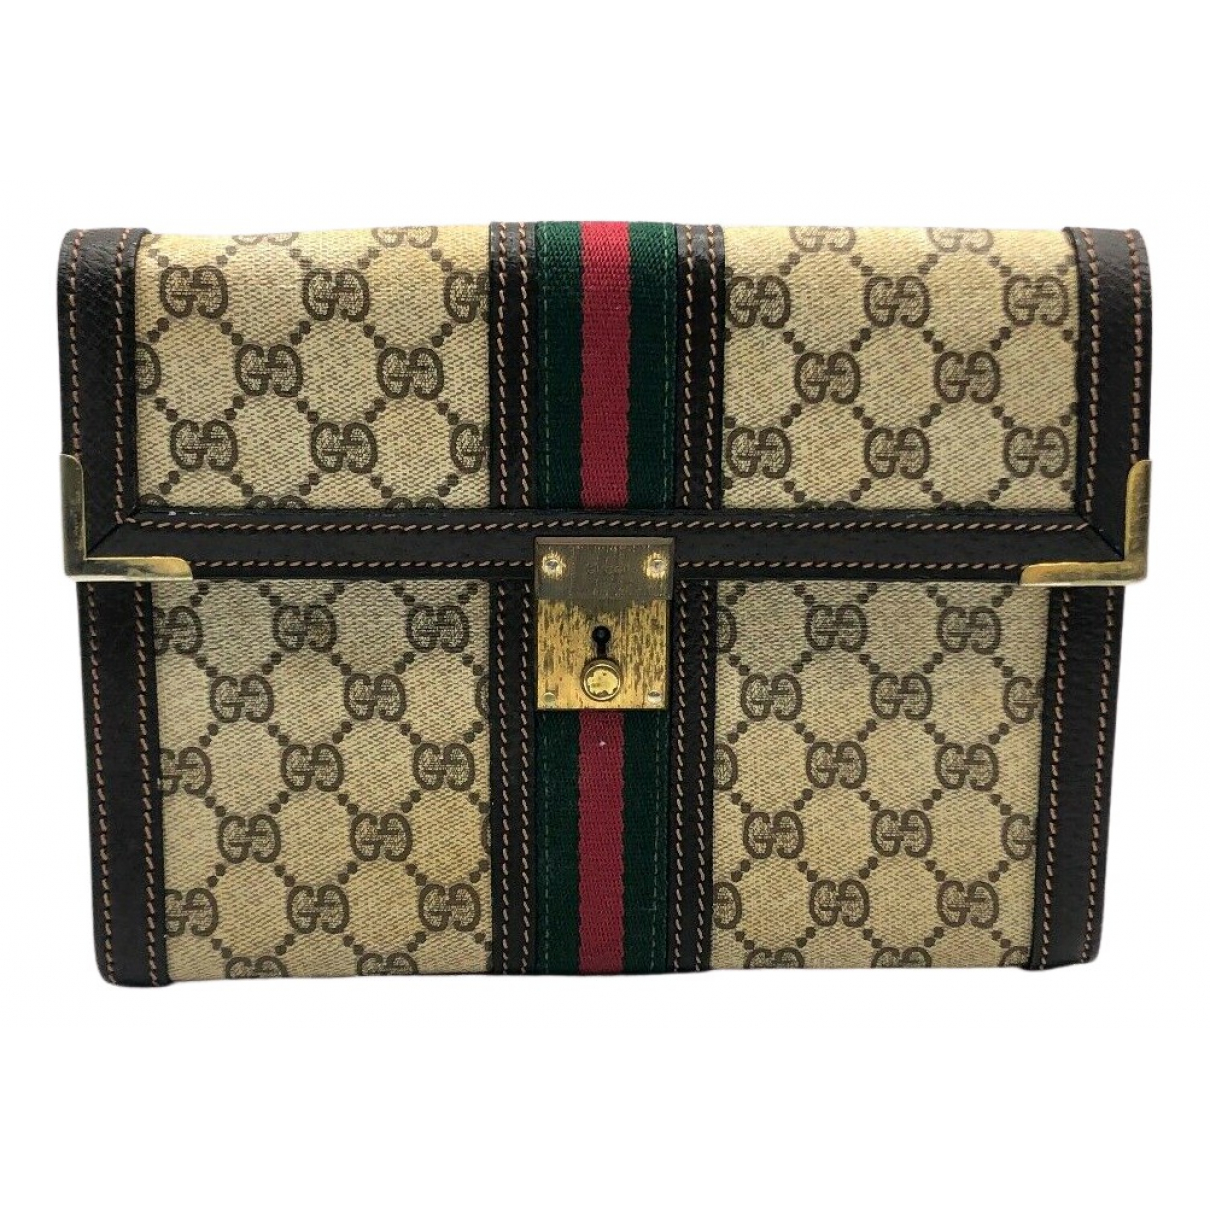 Gucci N Beige Cloth Clutch bag for Women N